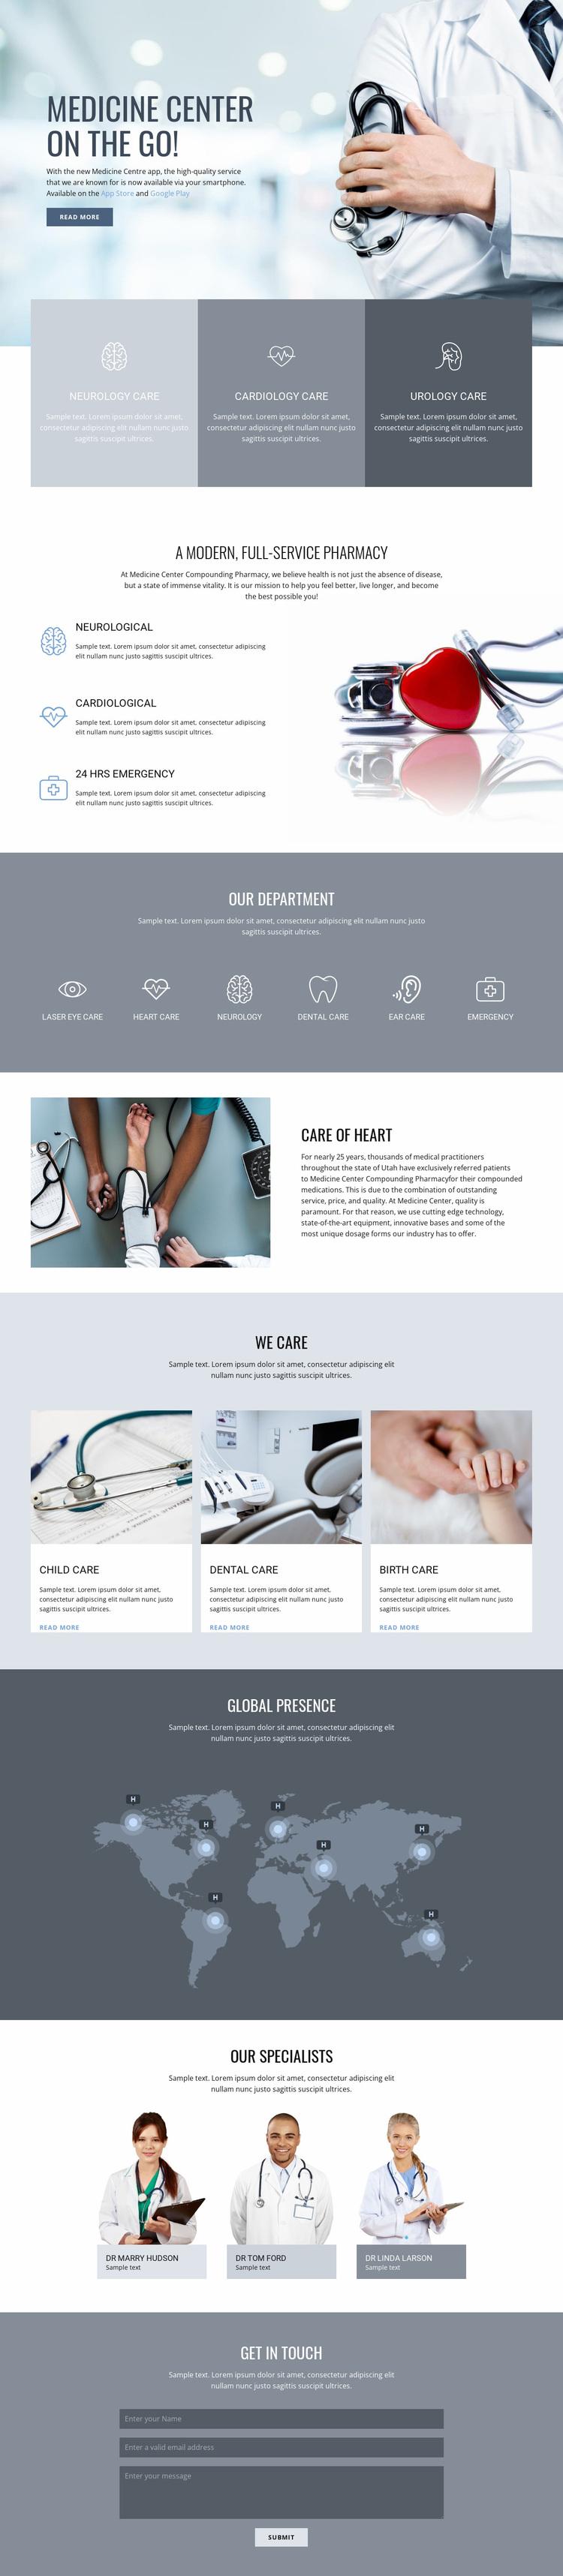 Pharmacy and medicine Website Design